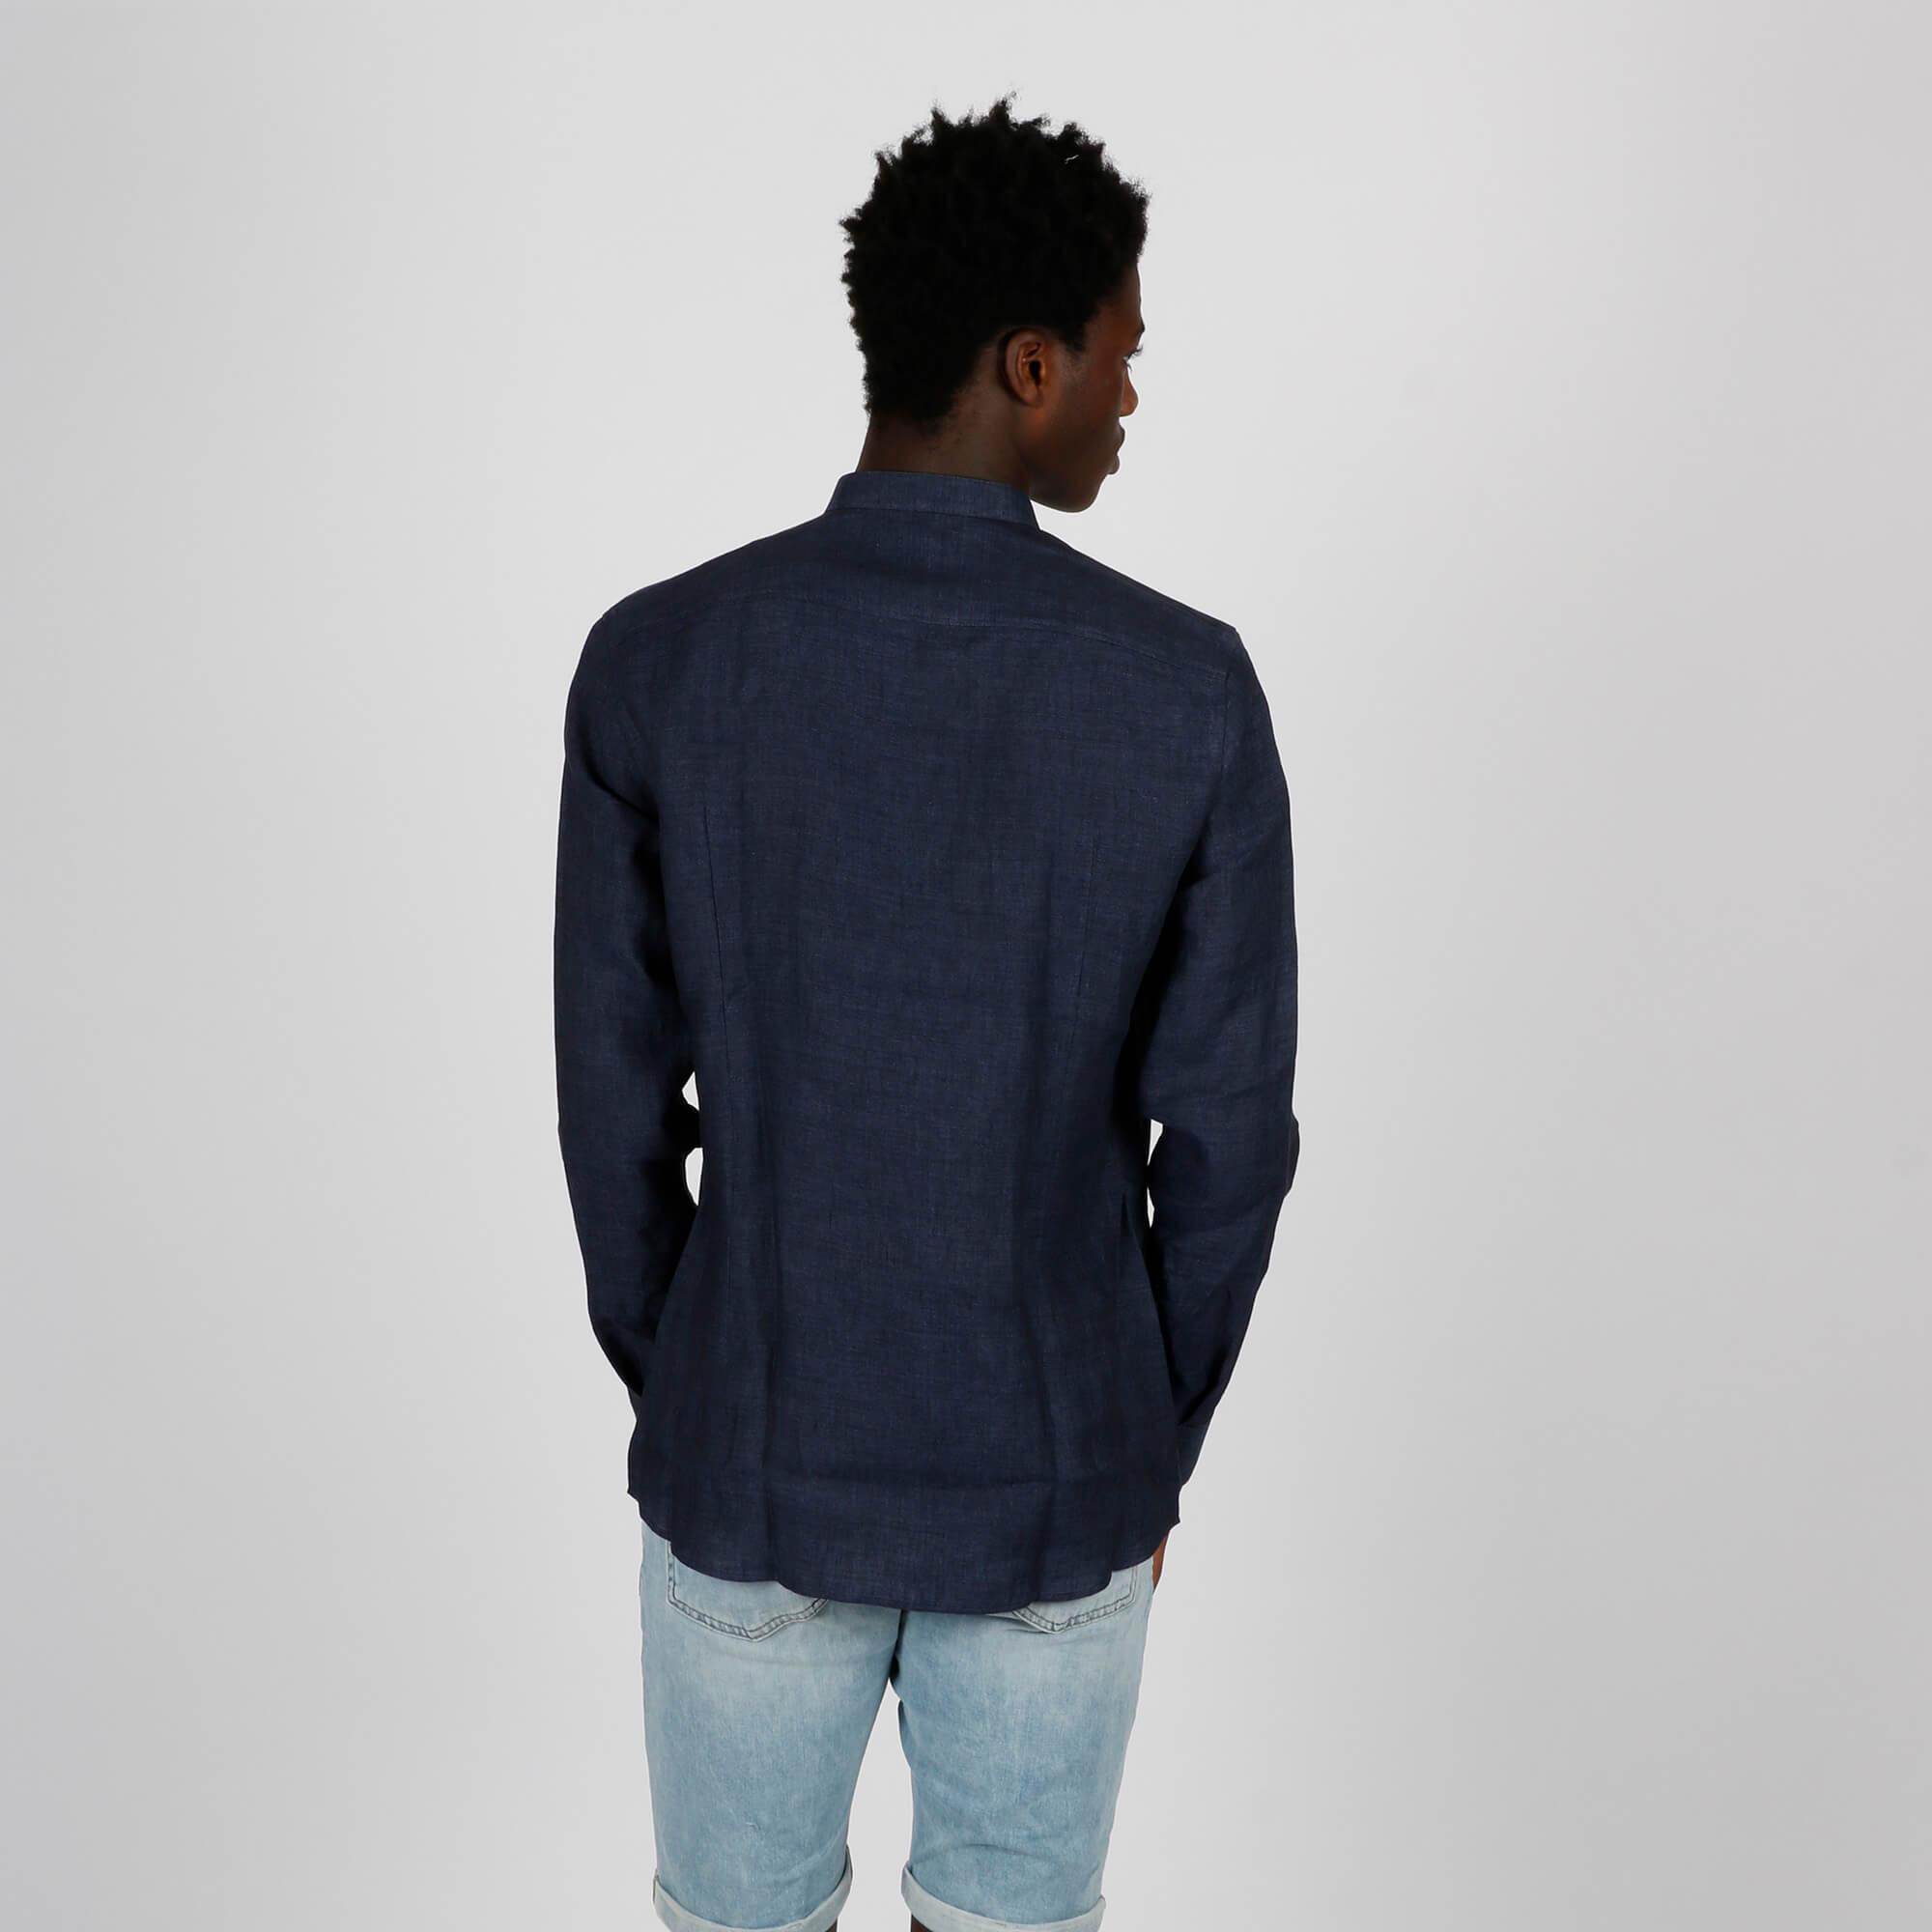 Camicia coreano lino - Navy